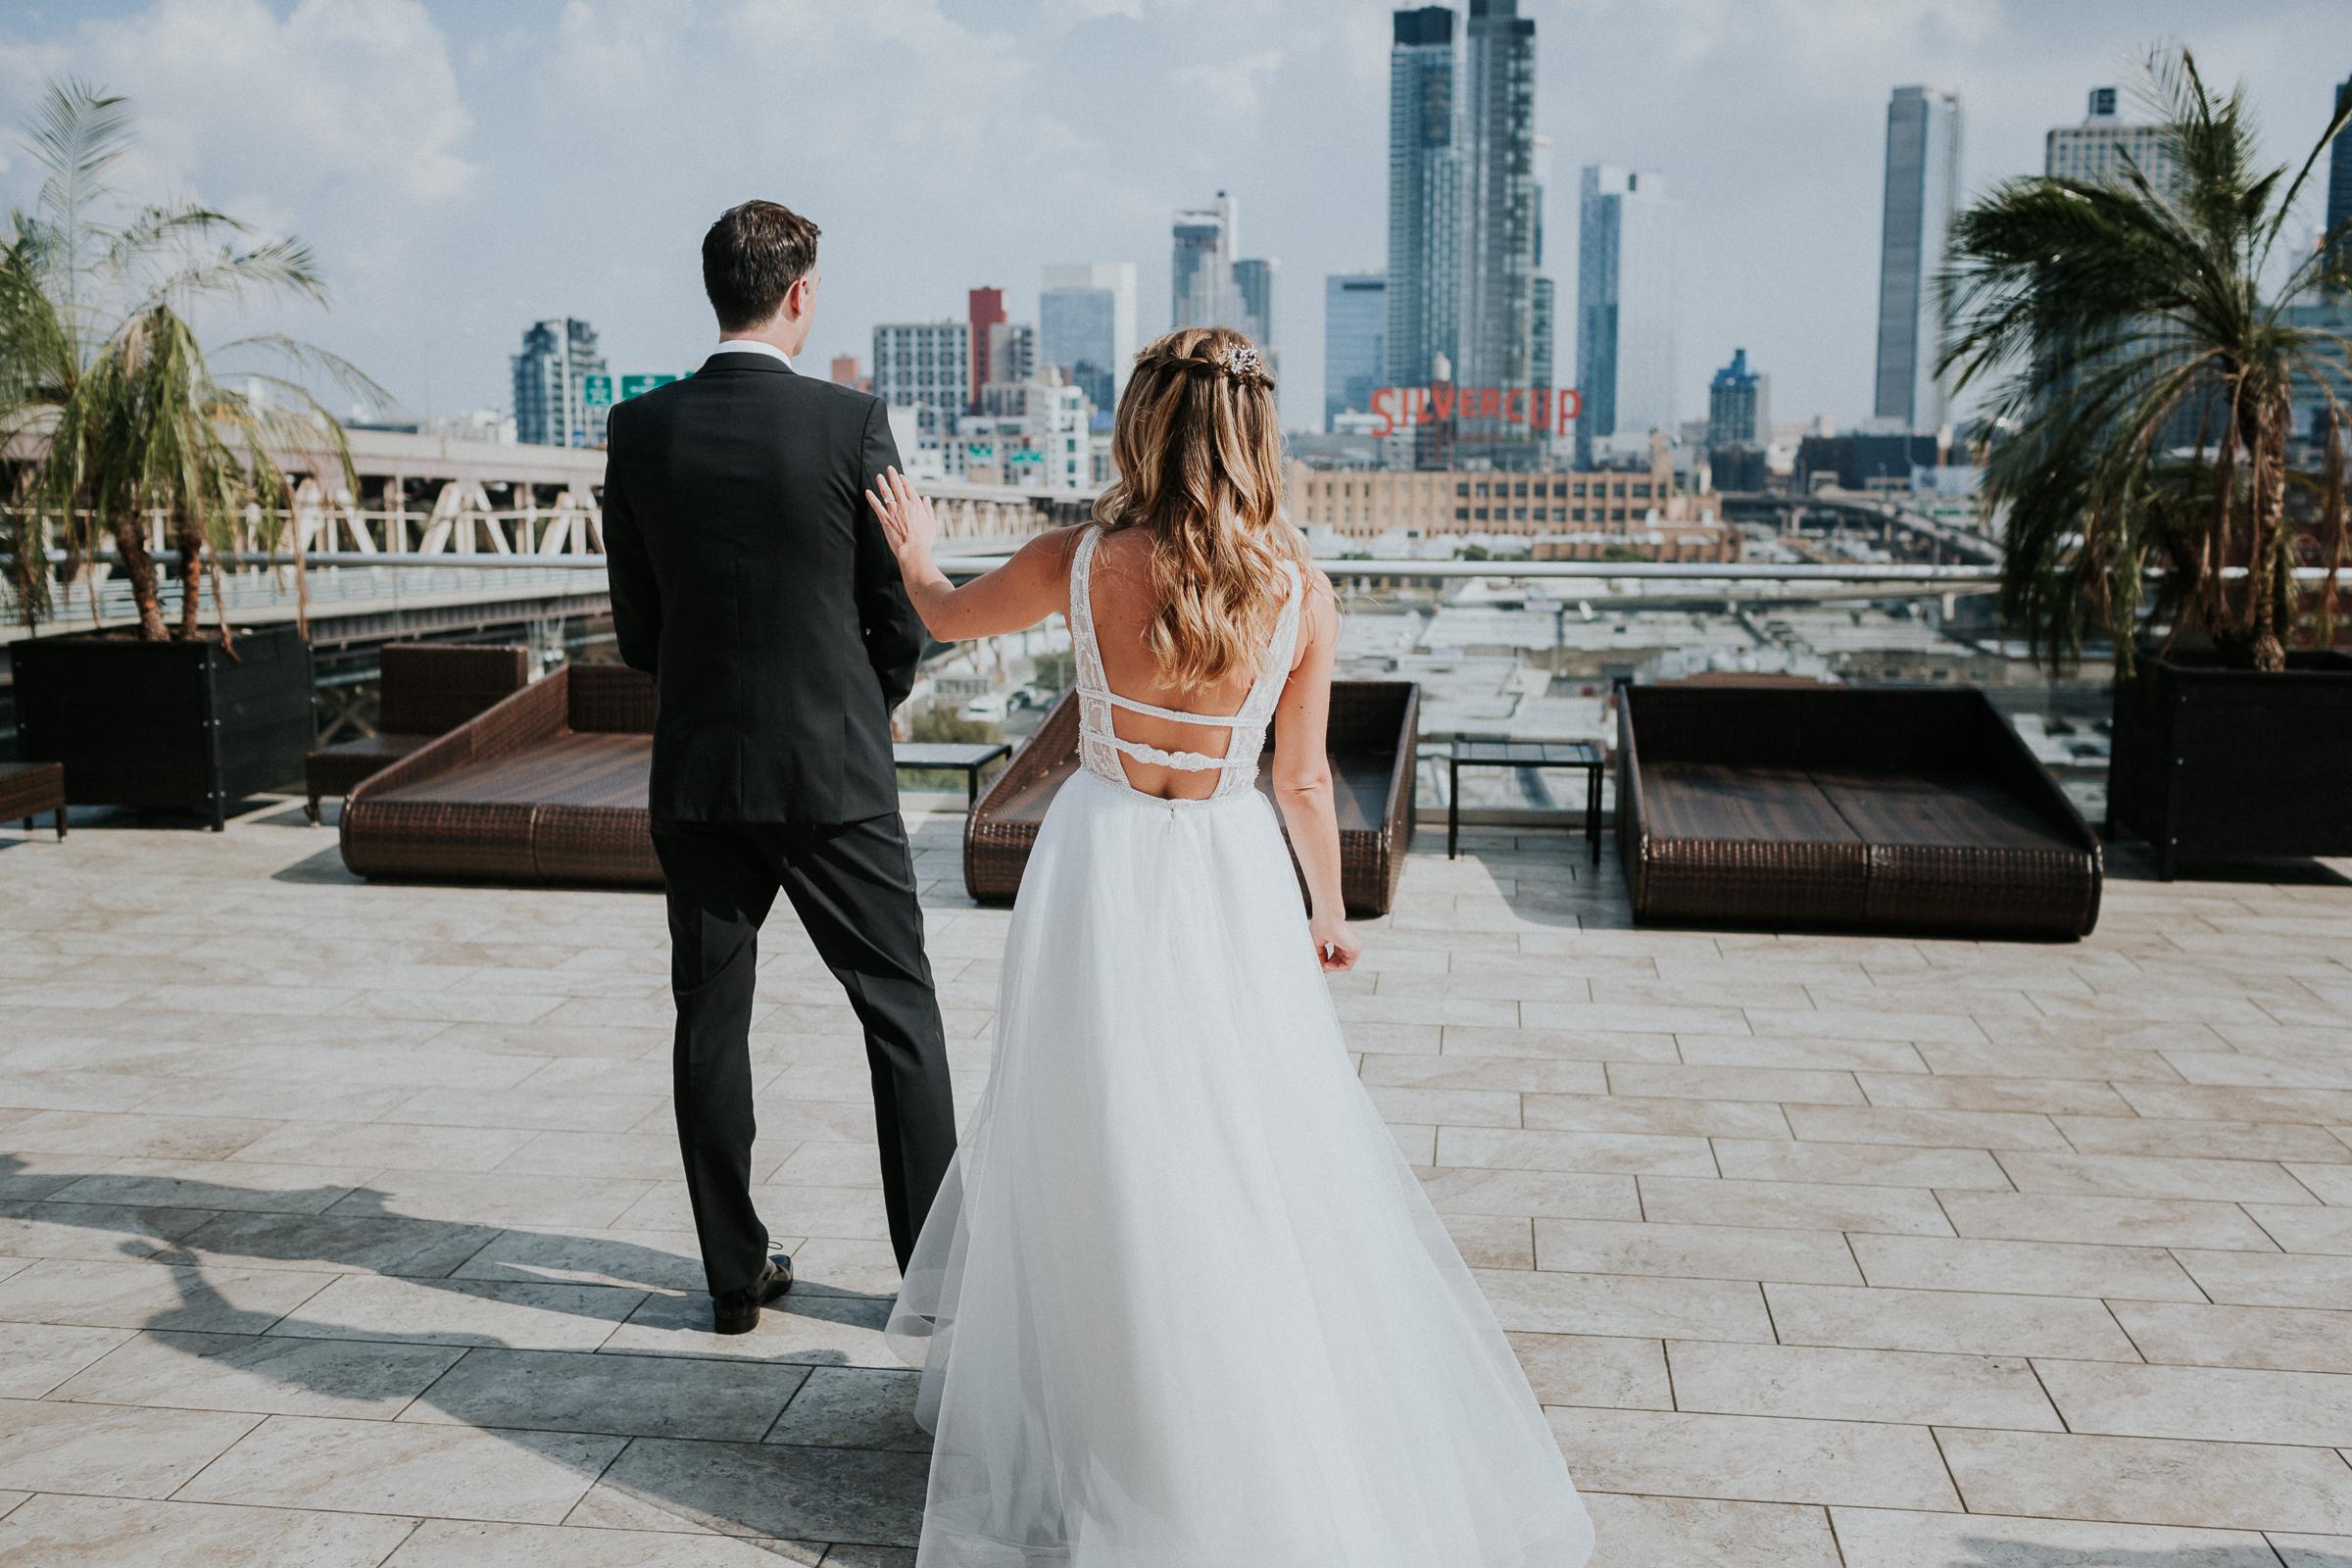 Ravel-Hotel-Penthouse-808-Long-Island-City-New-York-Documentary-Wedding-Photographer-20.jpg